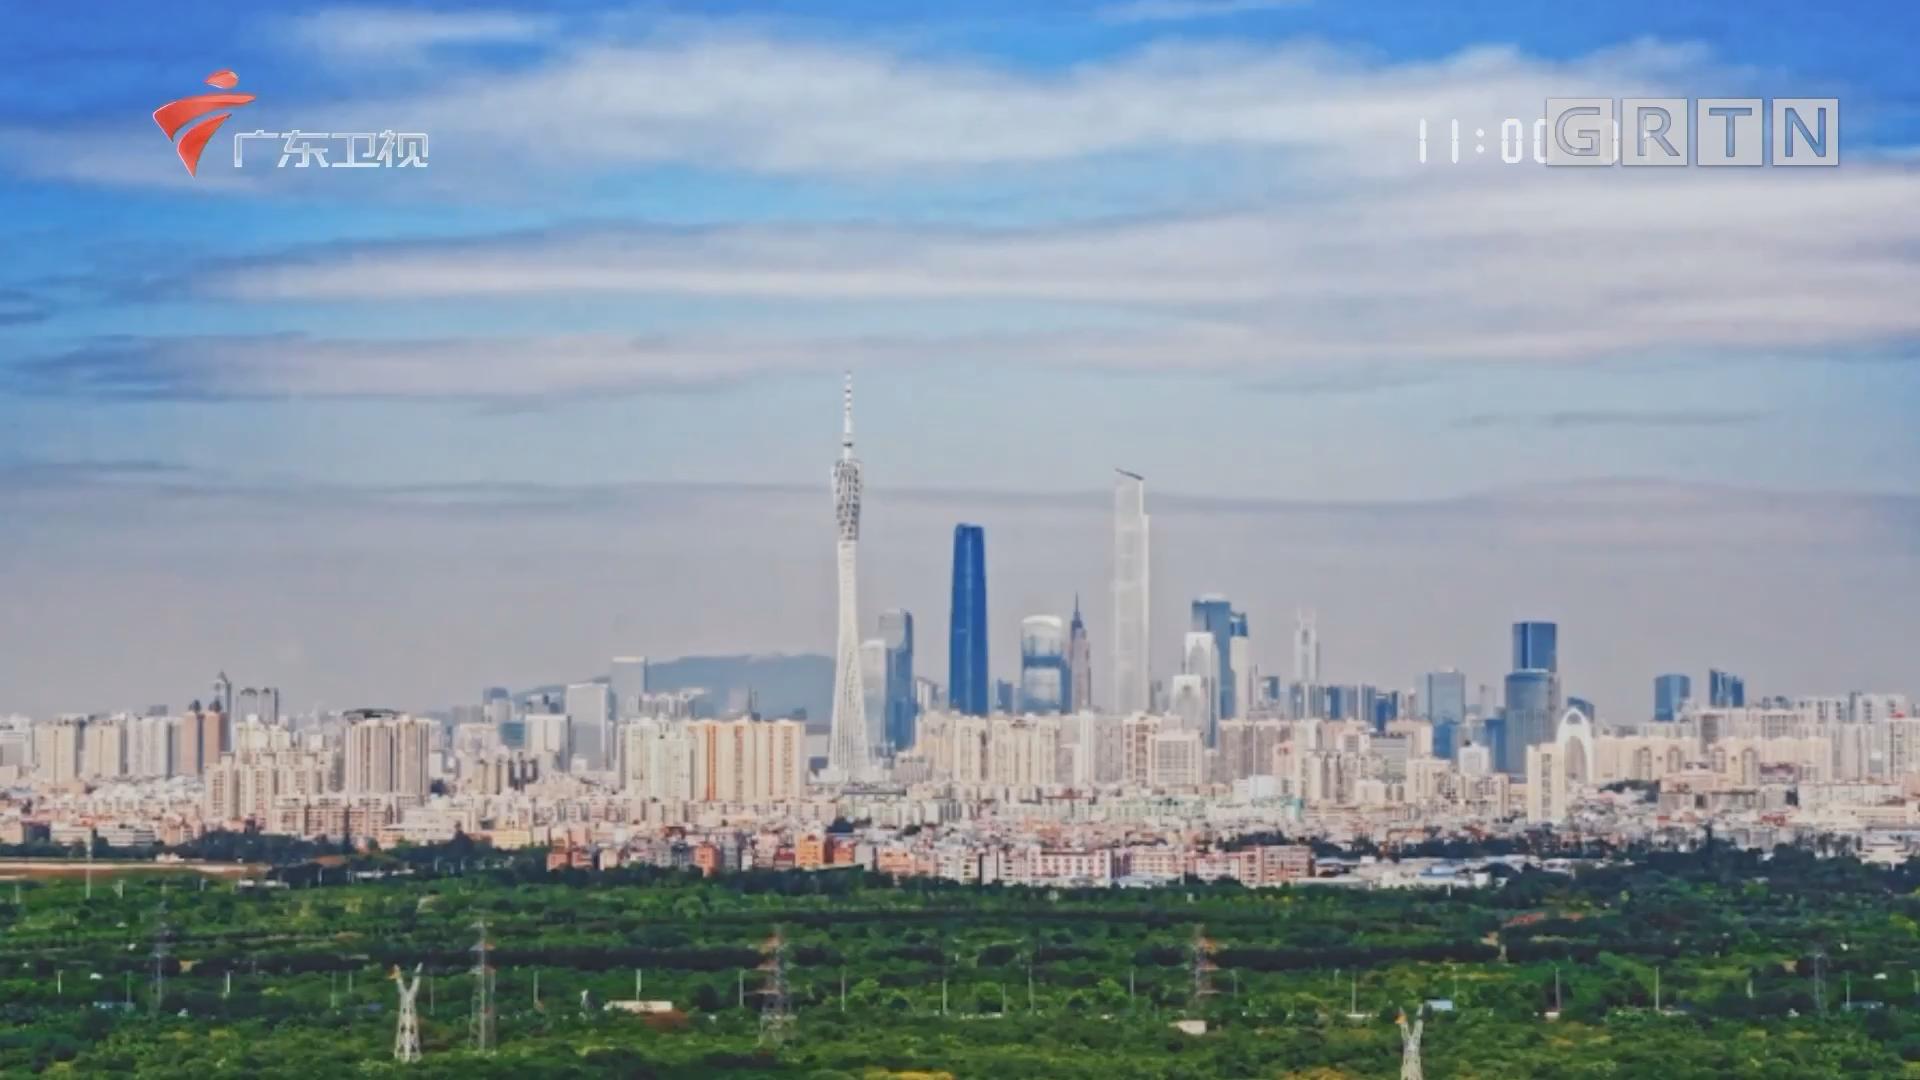 [HD][2019-08-18]飞越manbetx手机版 - 登陆:肇庆